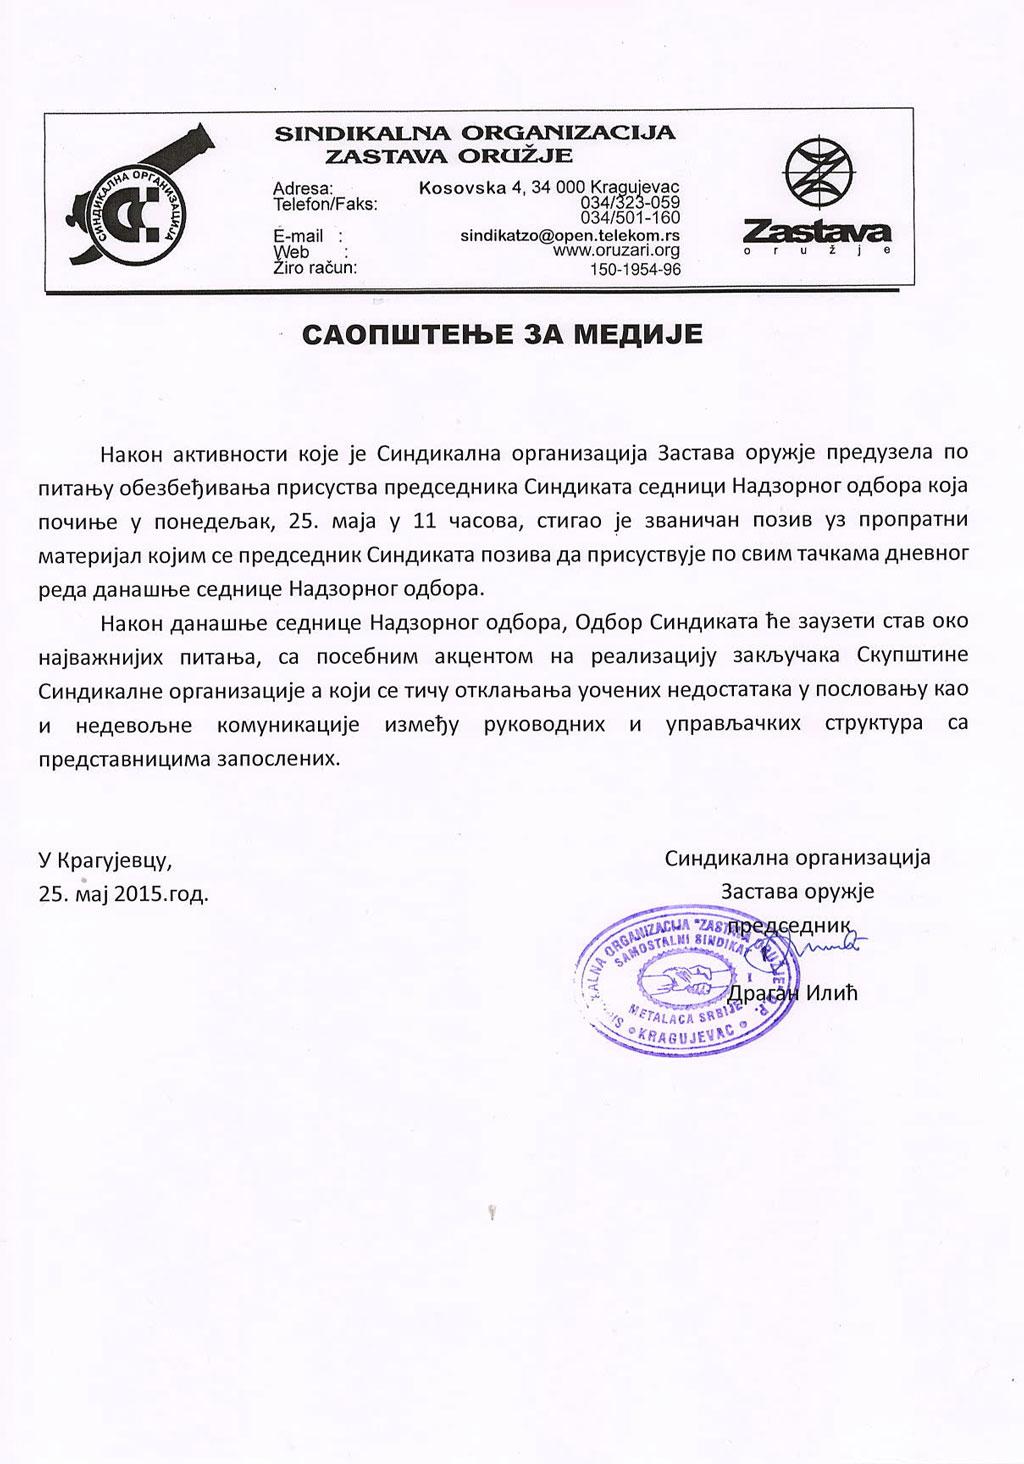 info-II-25maj2015